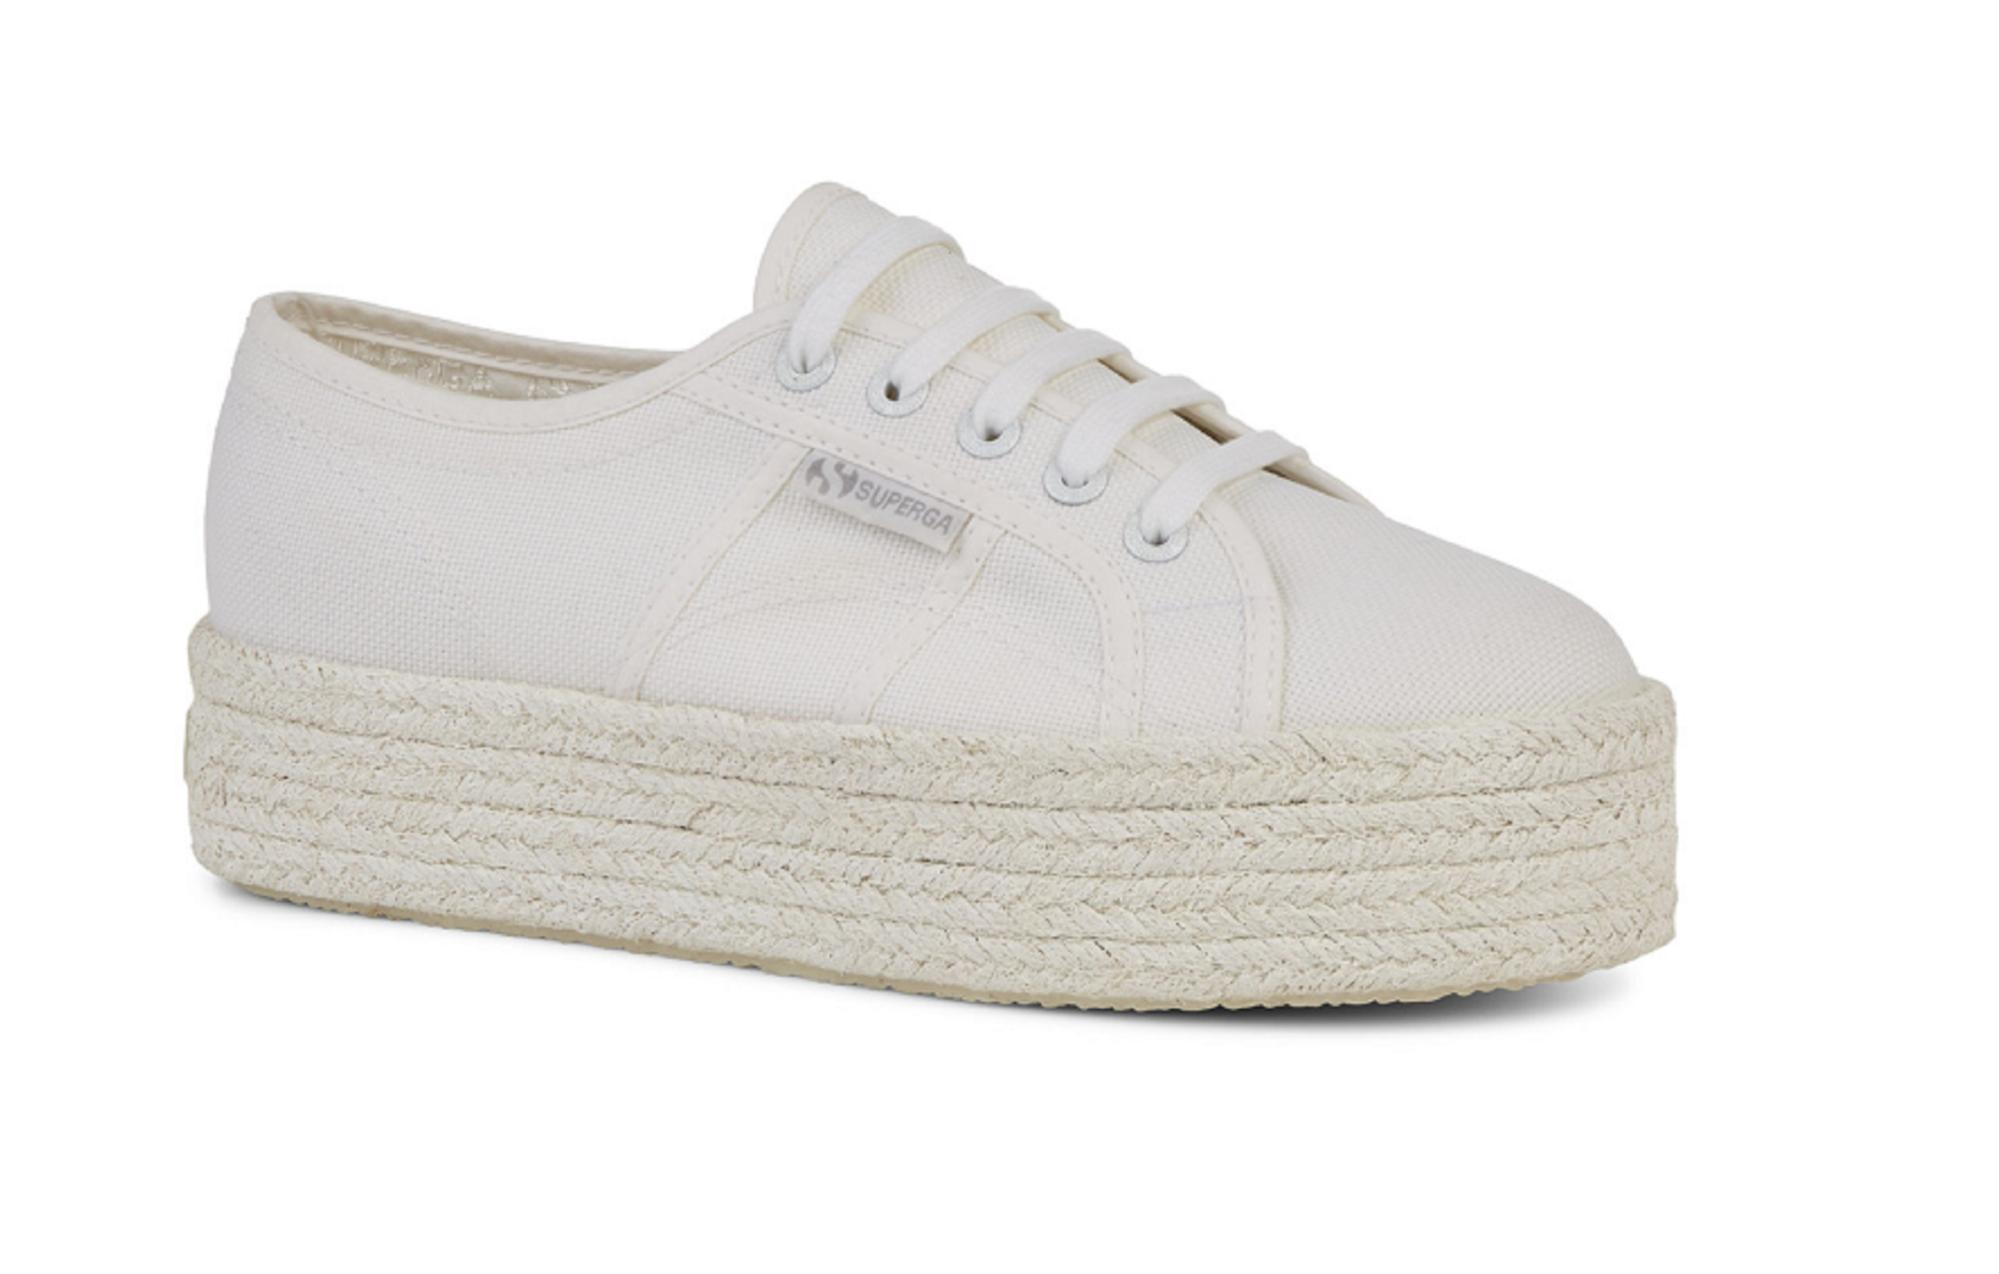 SUPERGA C4Z0 total white bianco scarpe donna sneakers platform lacci